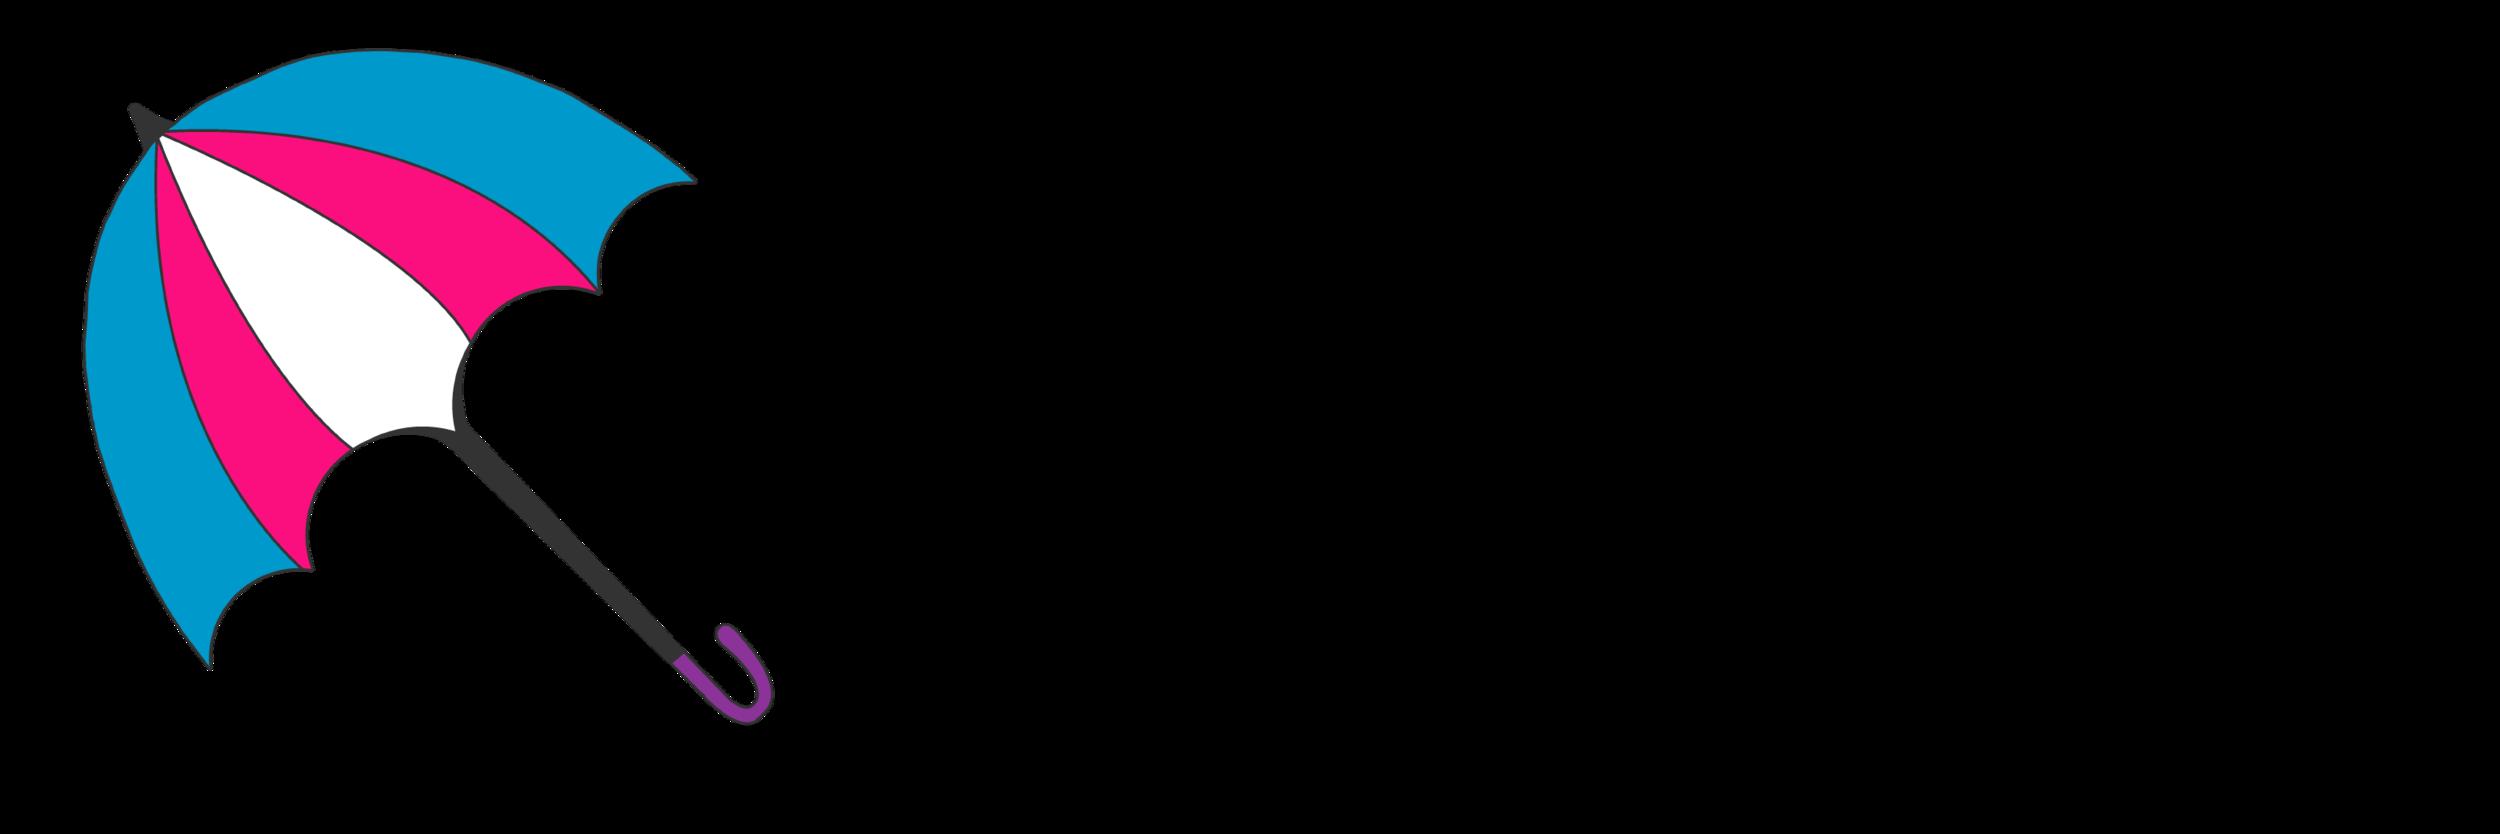 mtug-logo-action-network-01.png